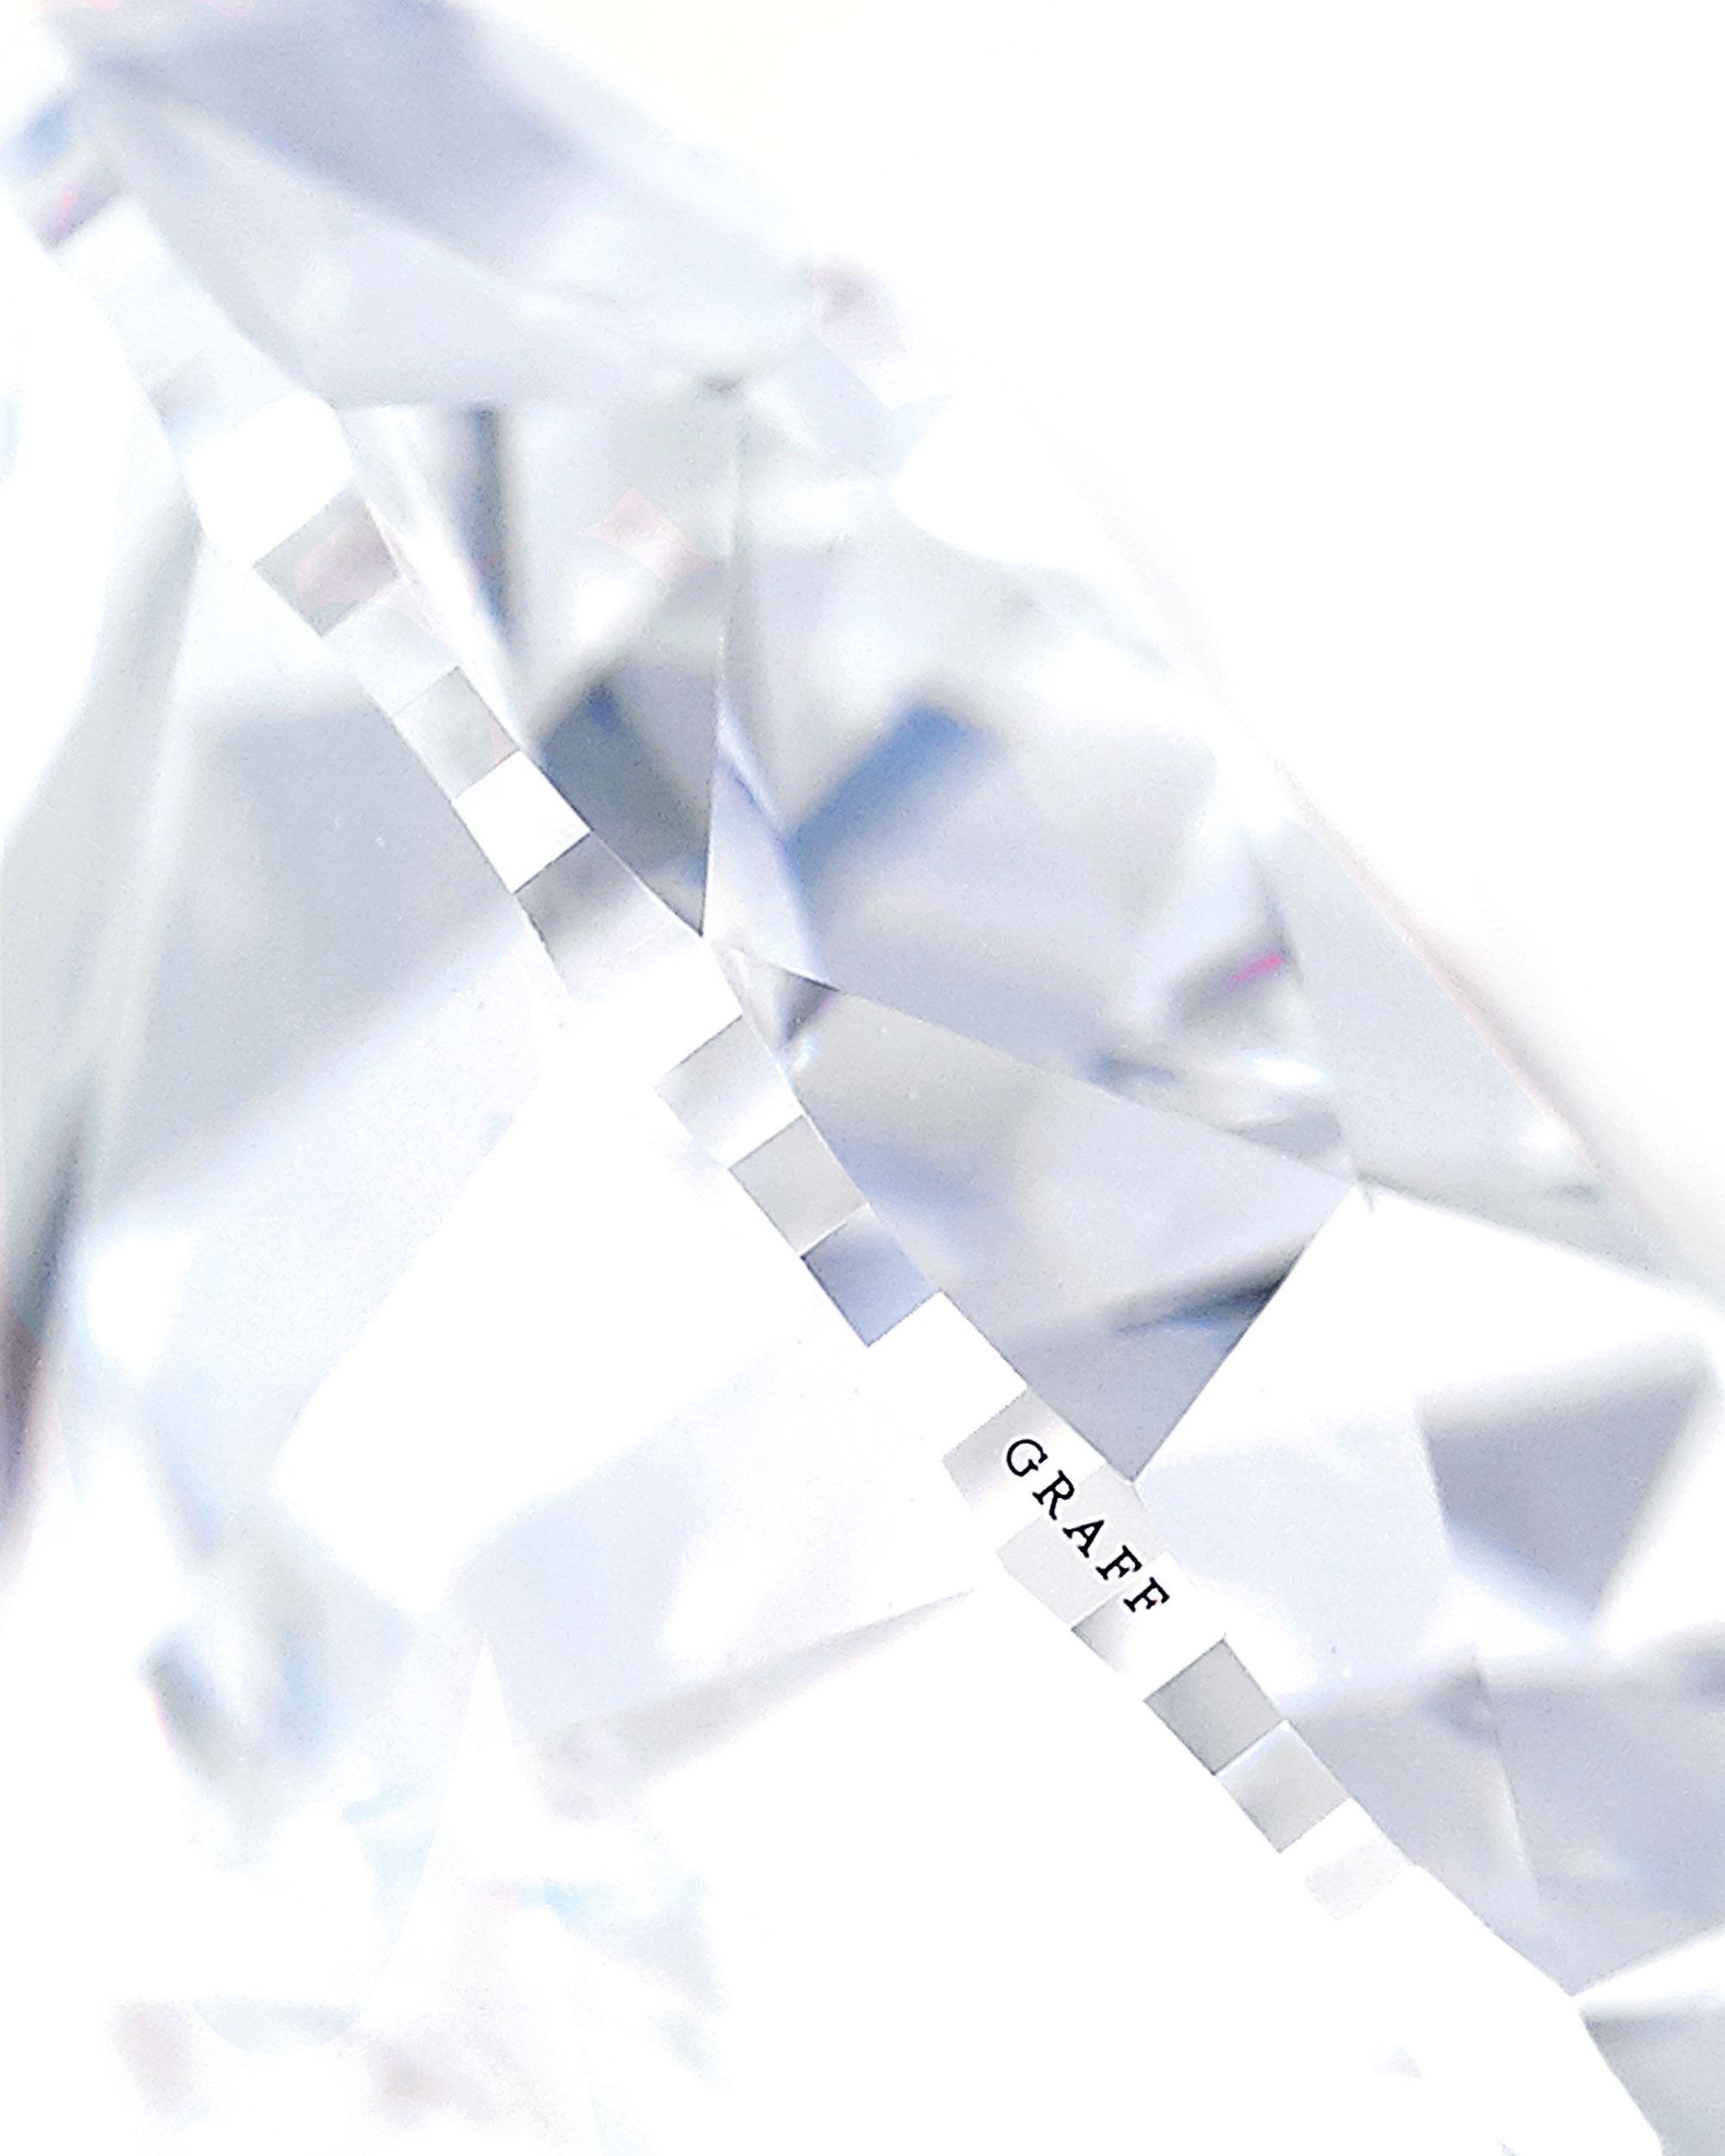 Close up of a Graff diamond